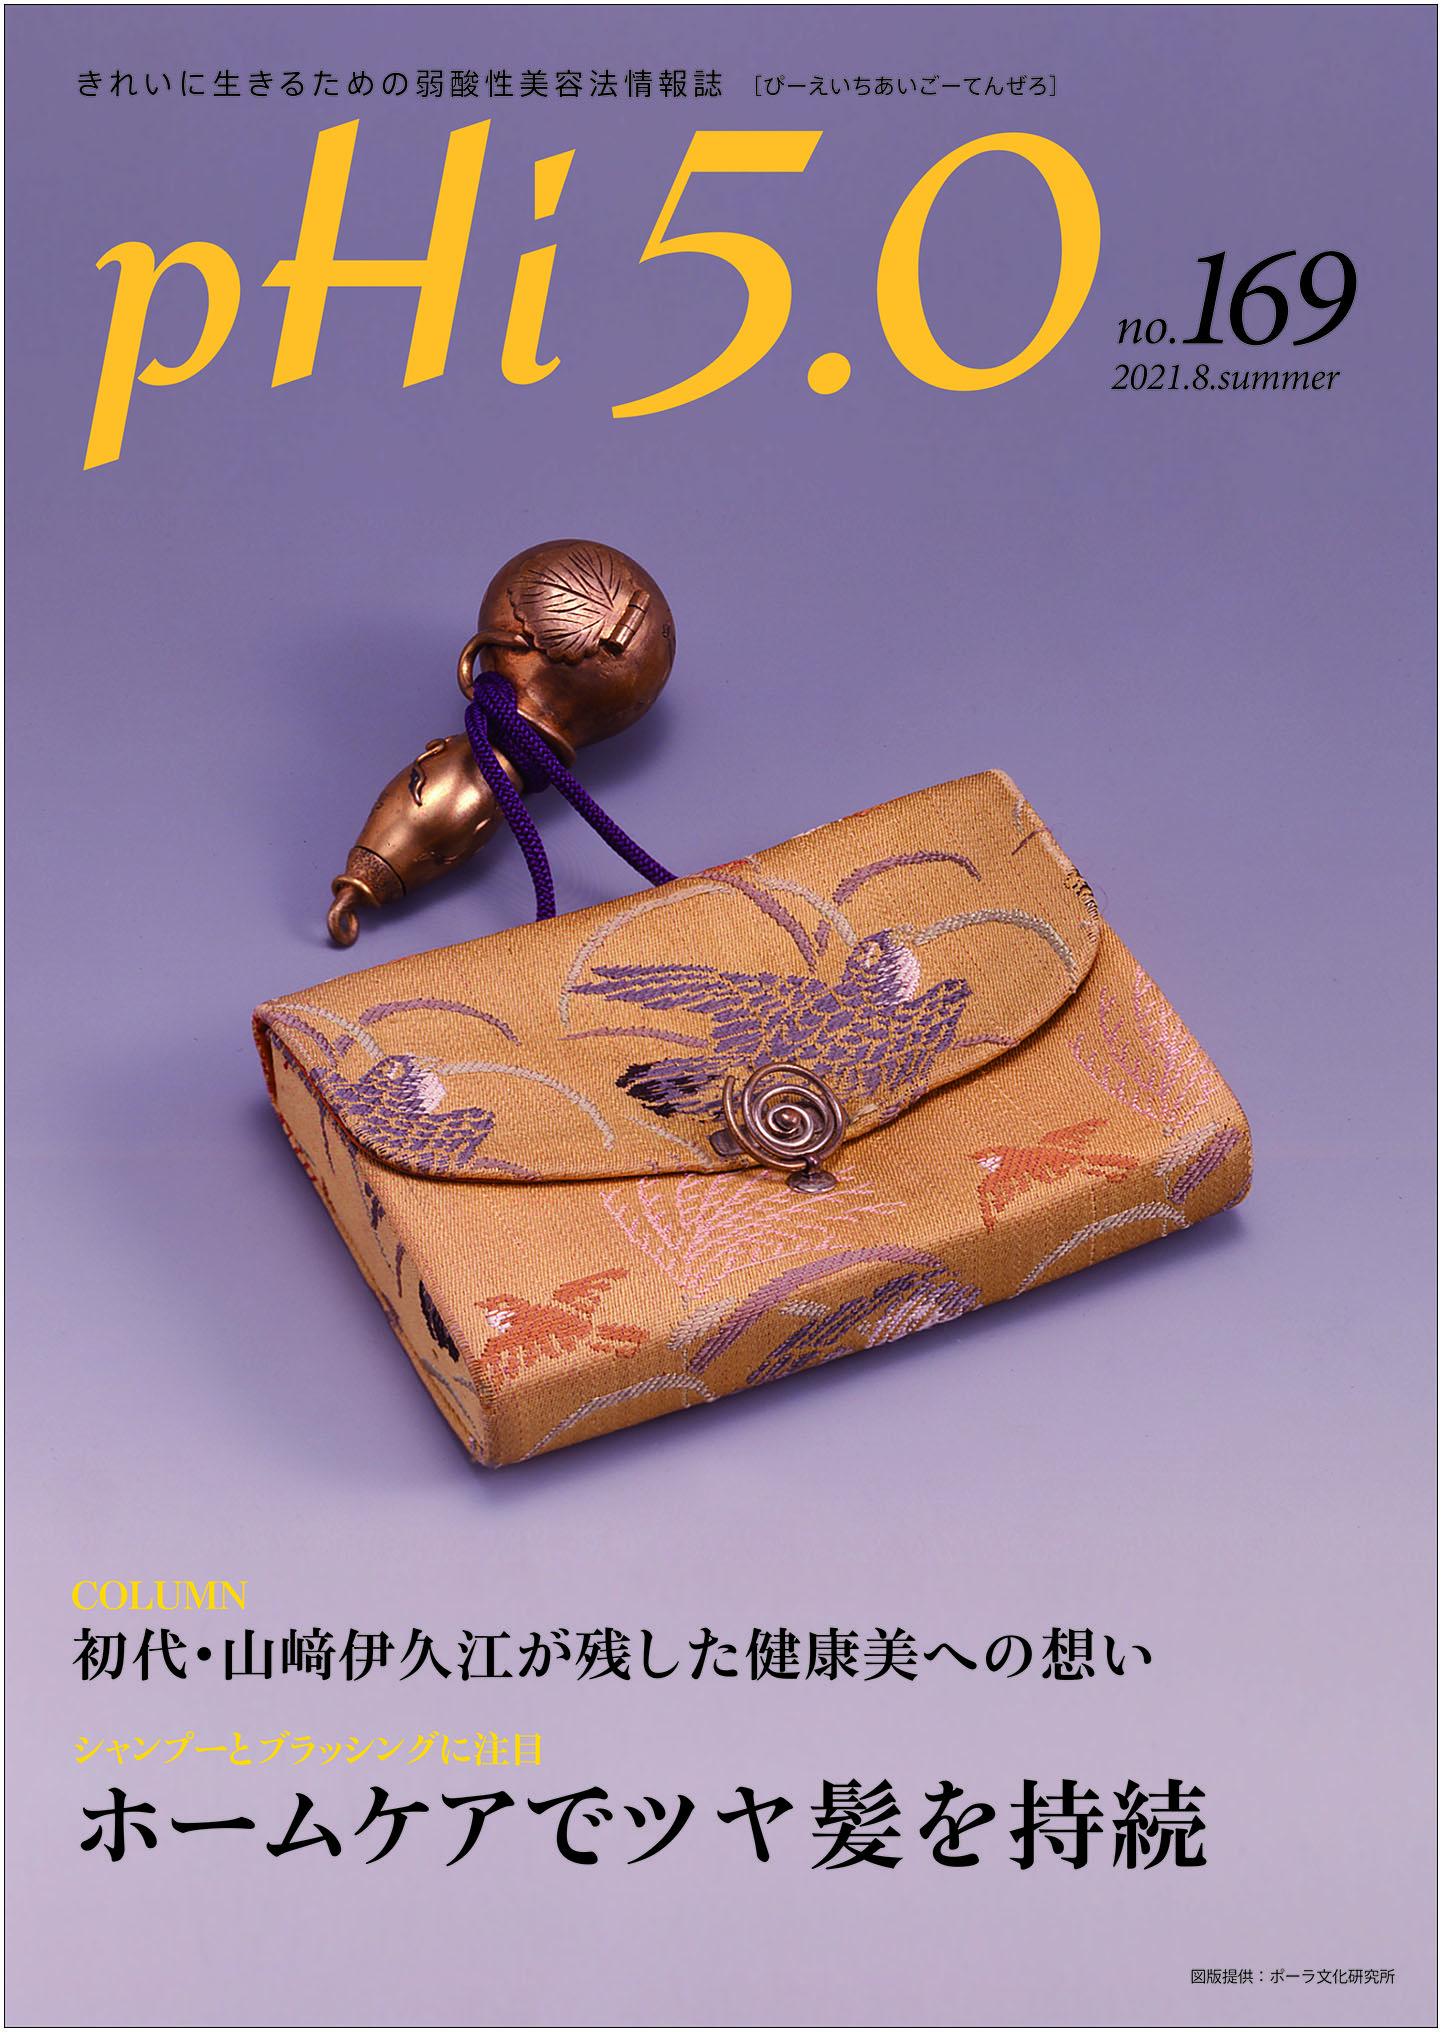 https://jakusan.net/community/images/169_h1.jpg